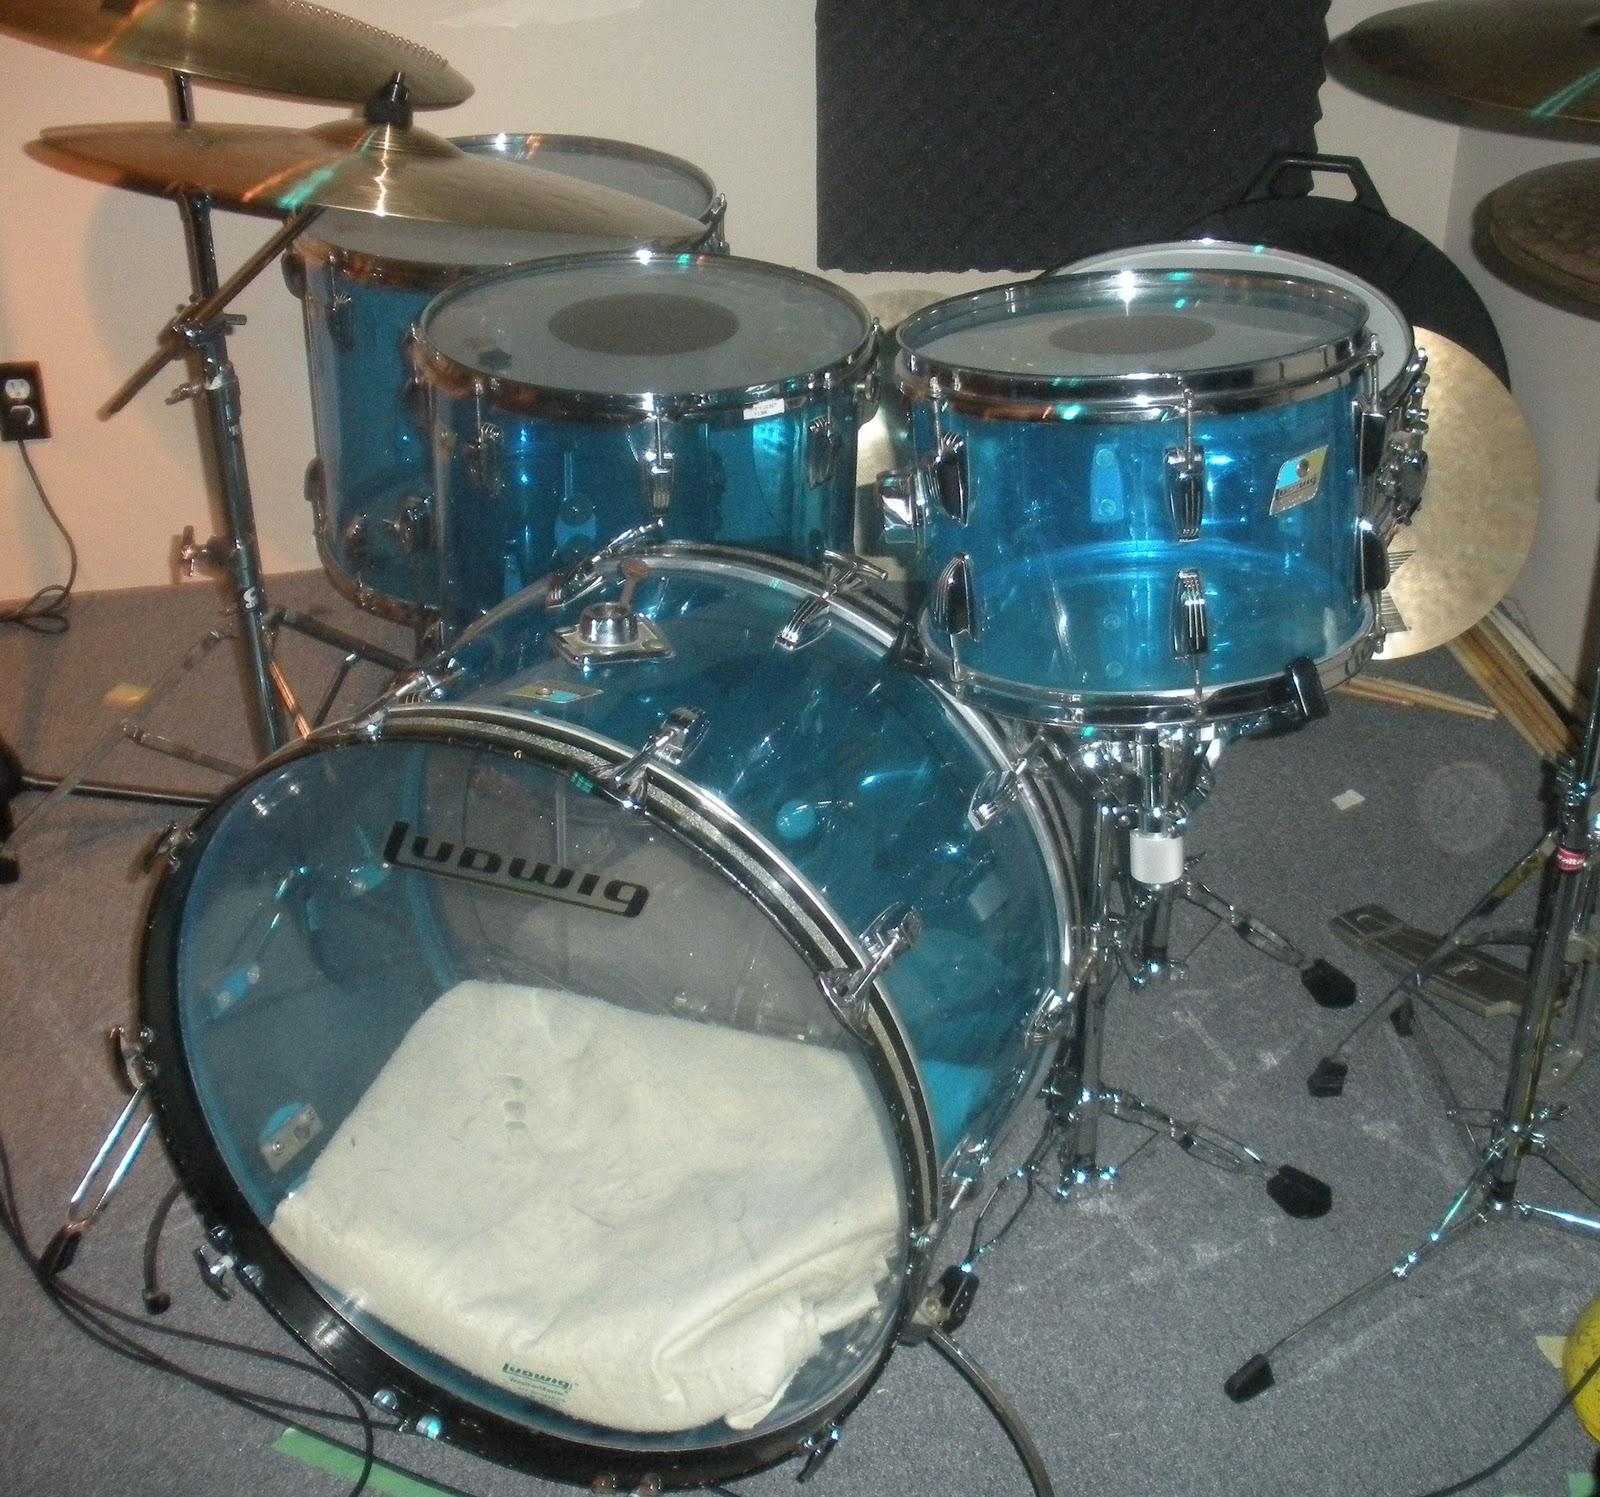 Ludwig Vista Lite Drums : my cubase studio ludwig vistalite drums ~ Vivirlamusica.com Haus und Dekorationen